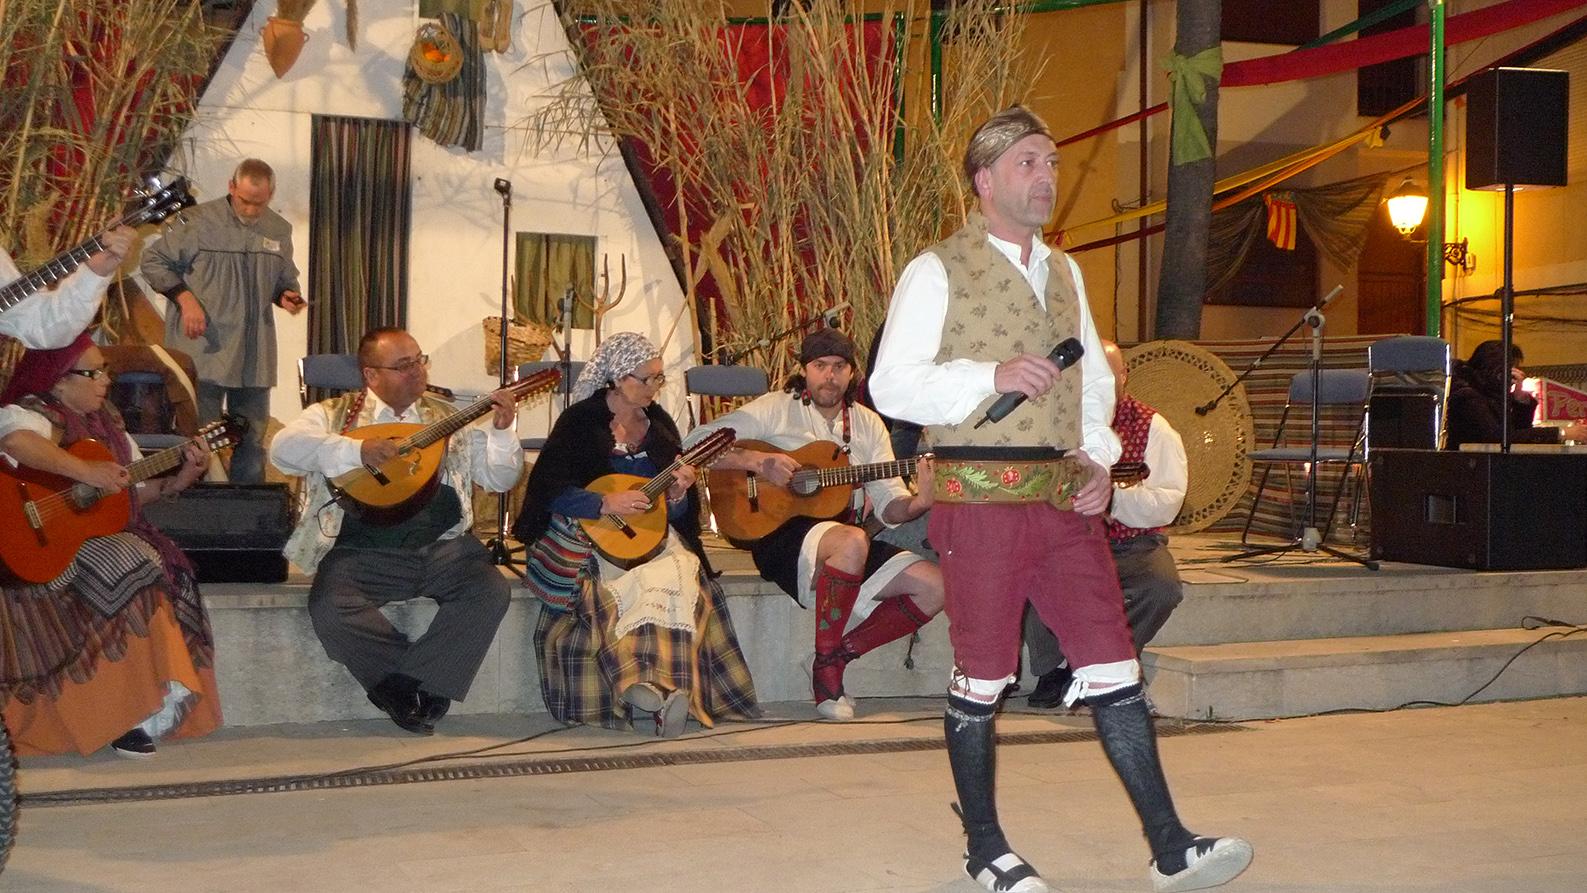 2014-02-23 - Baladre a Fira St. Marcia-ROTOVA (193)